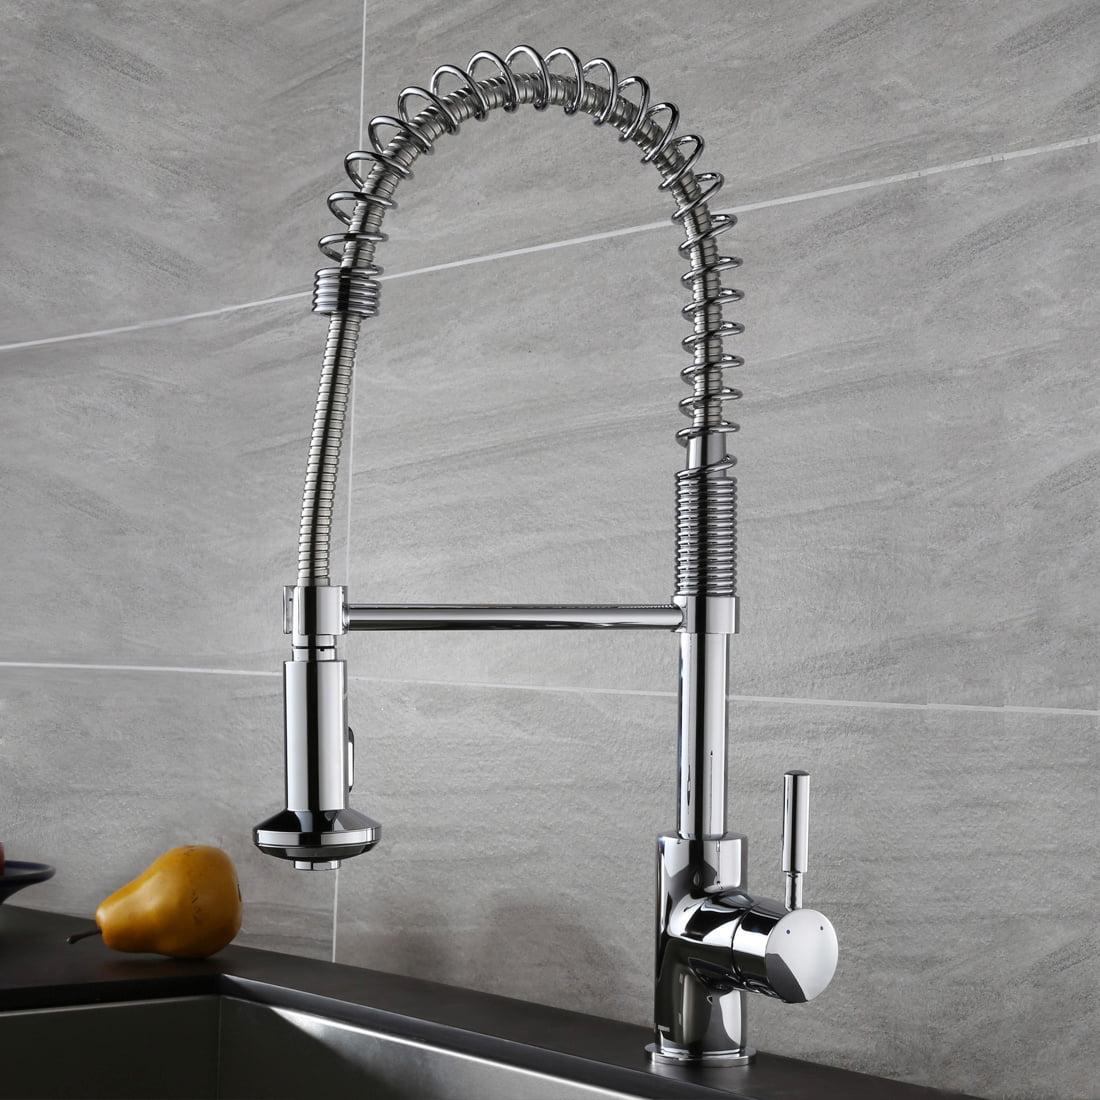 Keewi Kitchen Coil Faucet Chrome Commercial Kitchen Faucet Pull